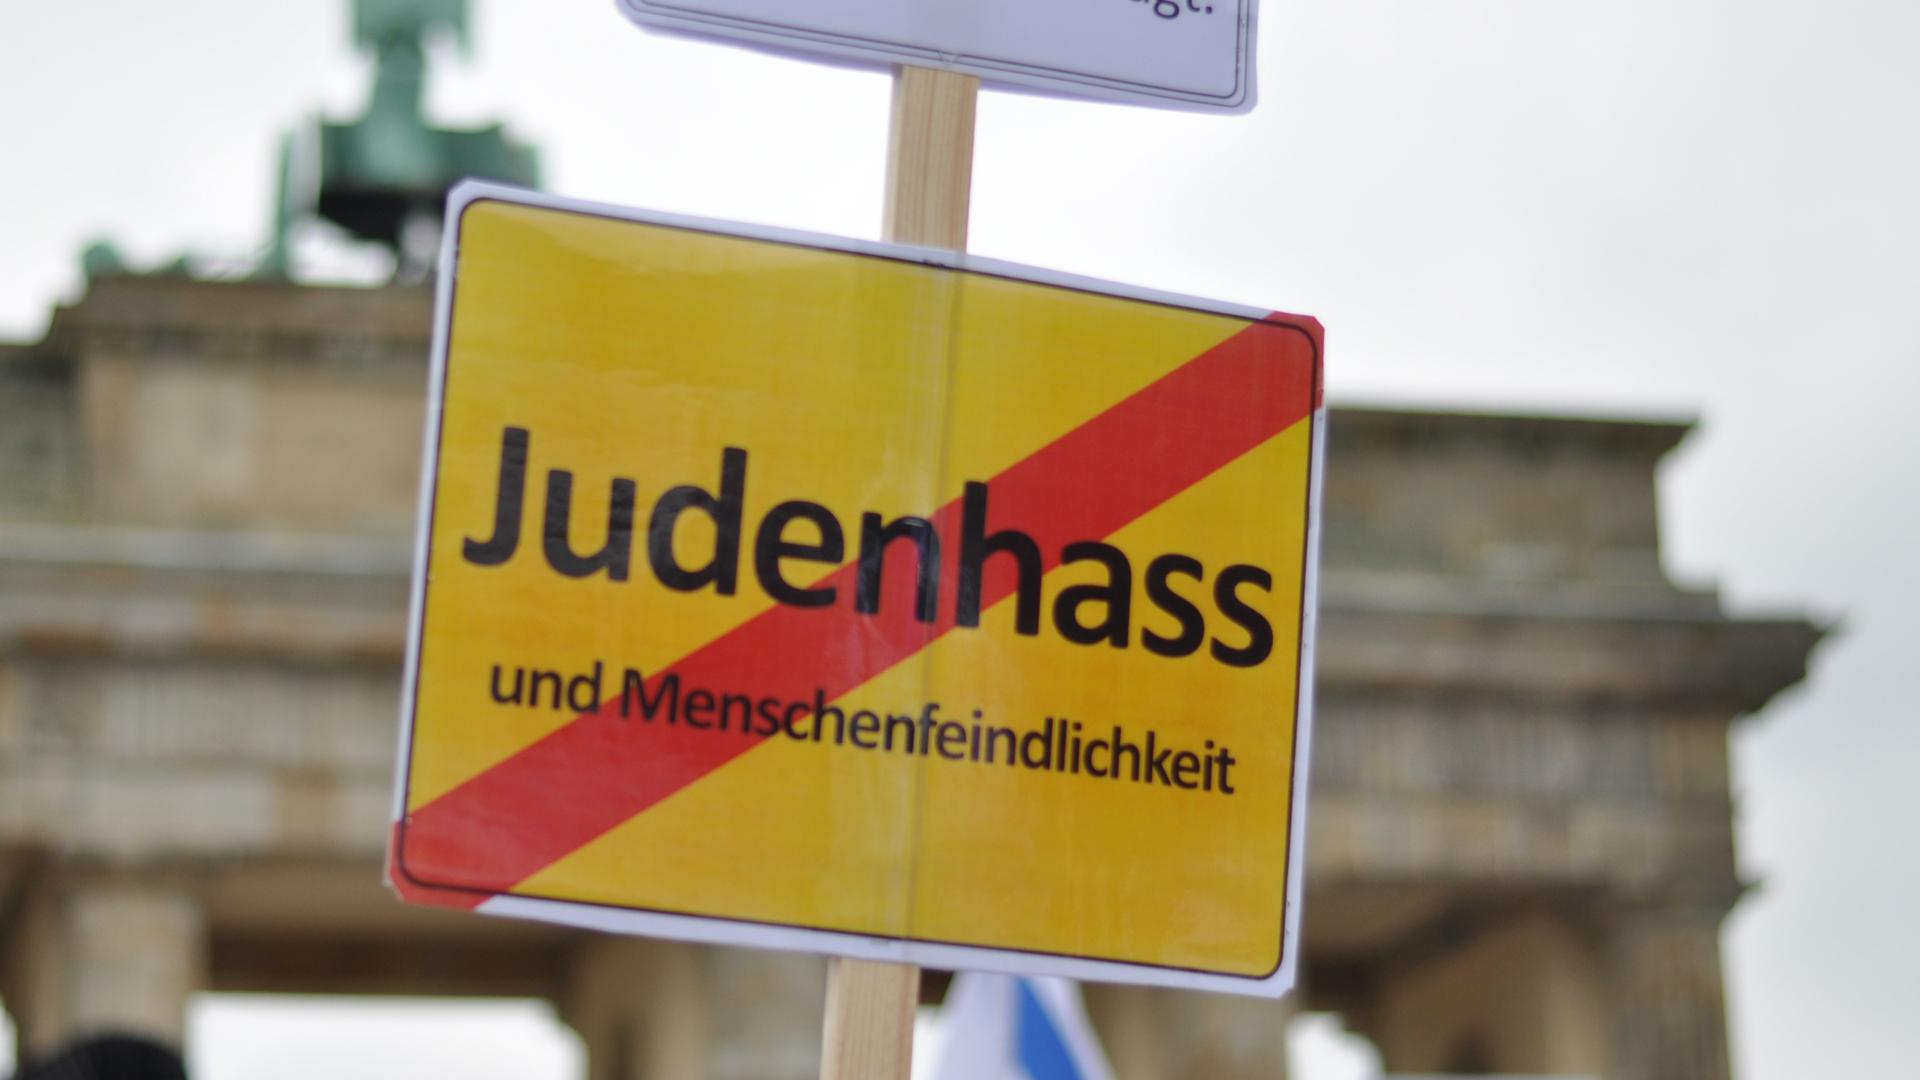 Demonstration gegen Antisemitismus 2014 vor dem Brandenburger Tor in Berlin (Archivbild)